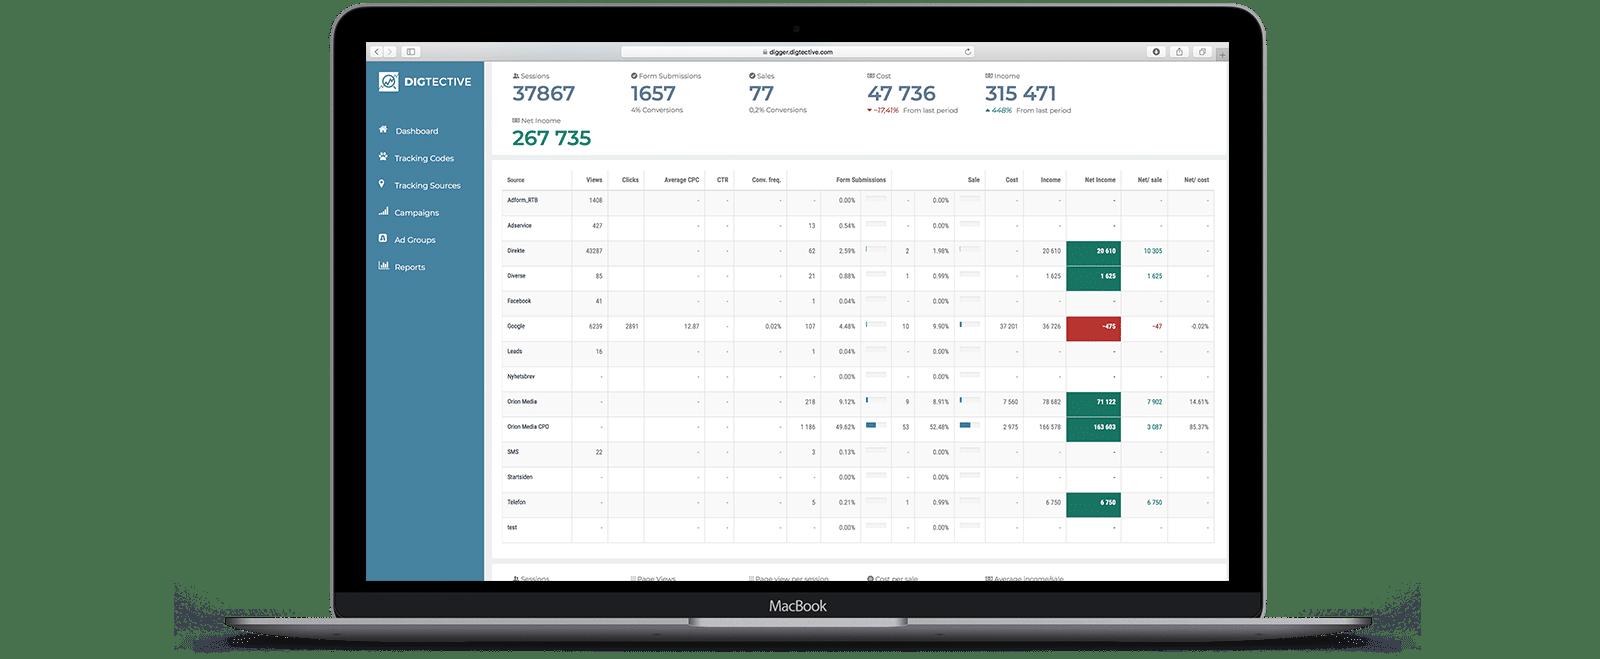 digtective cookieless web analytics dashboard